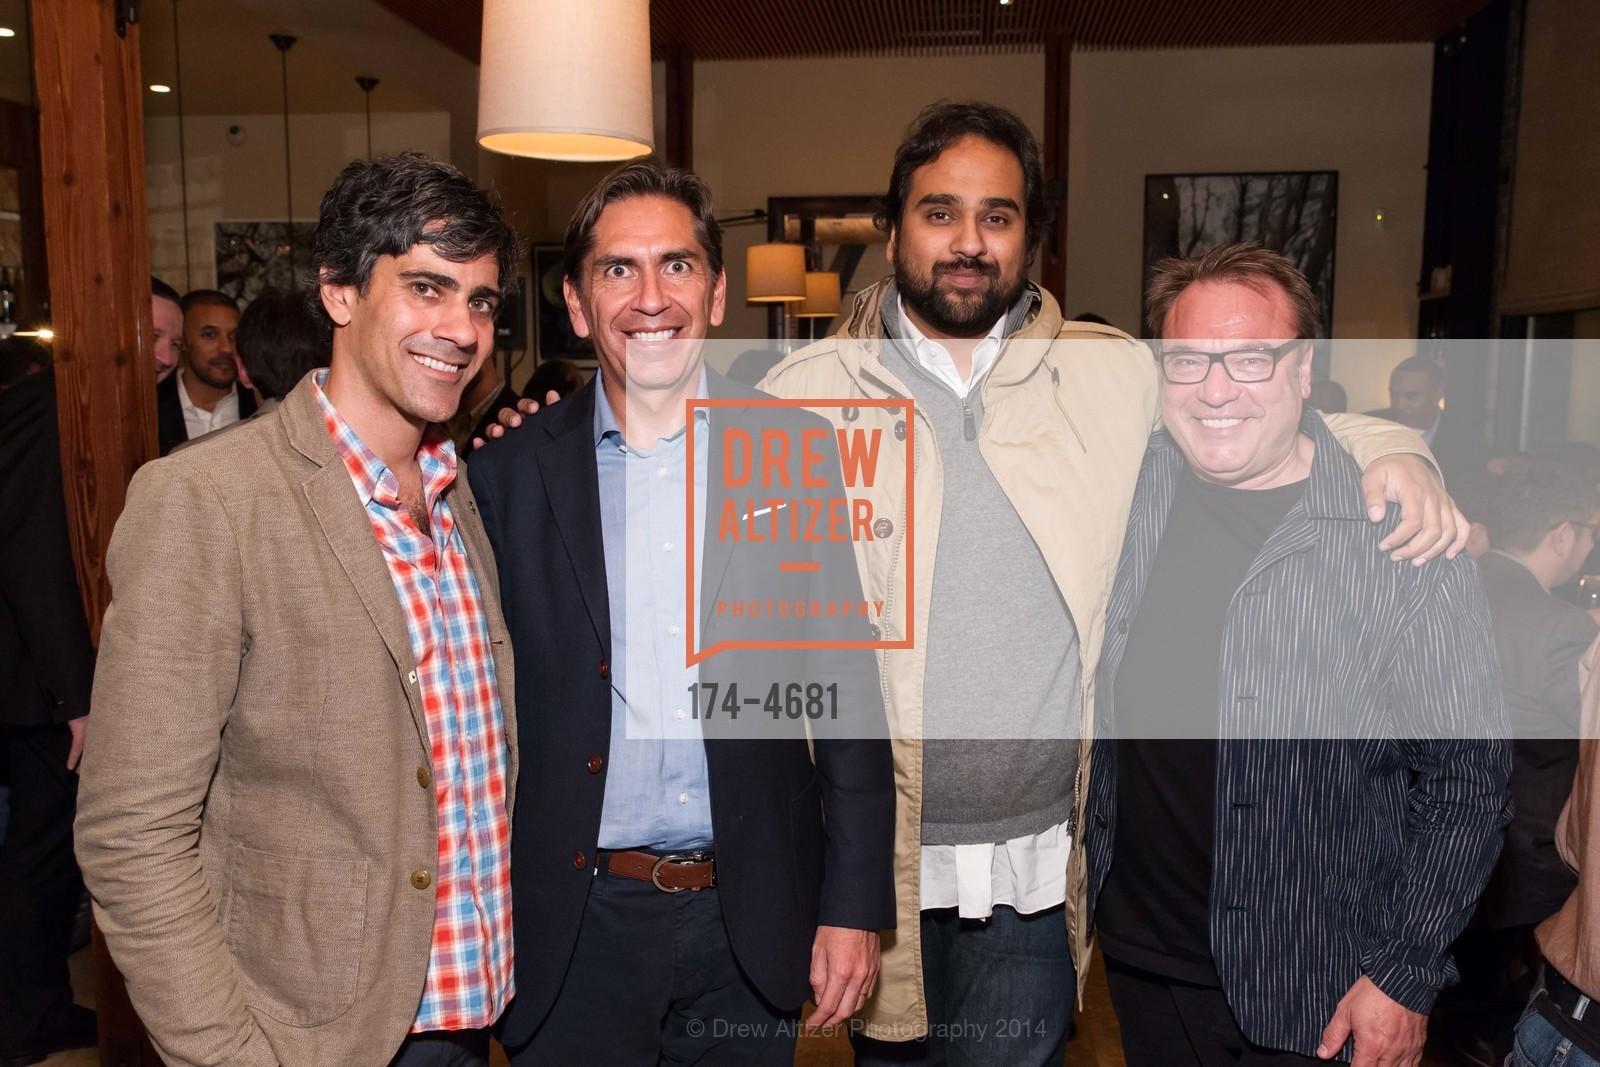 Jeremy Stoppelman, Jorge Ruiz, Hosain Rahman, Stanlee Gatti, Photo #174-4681